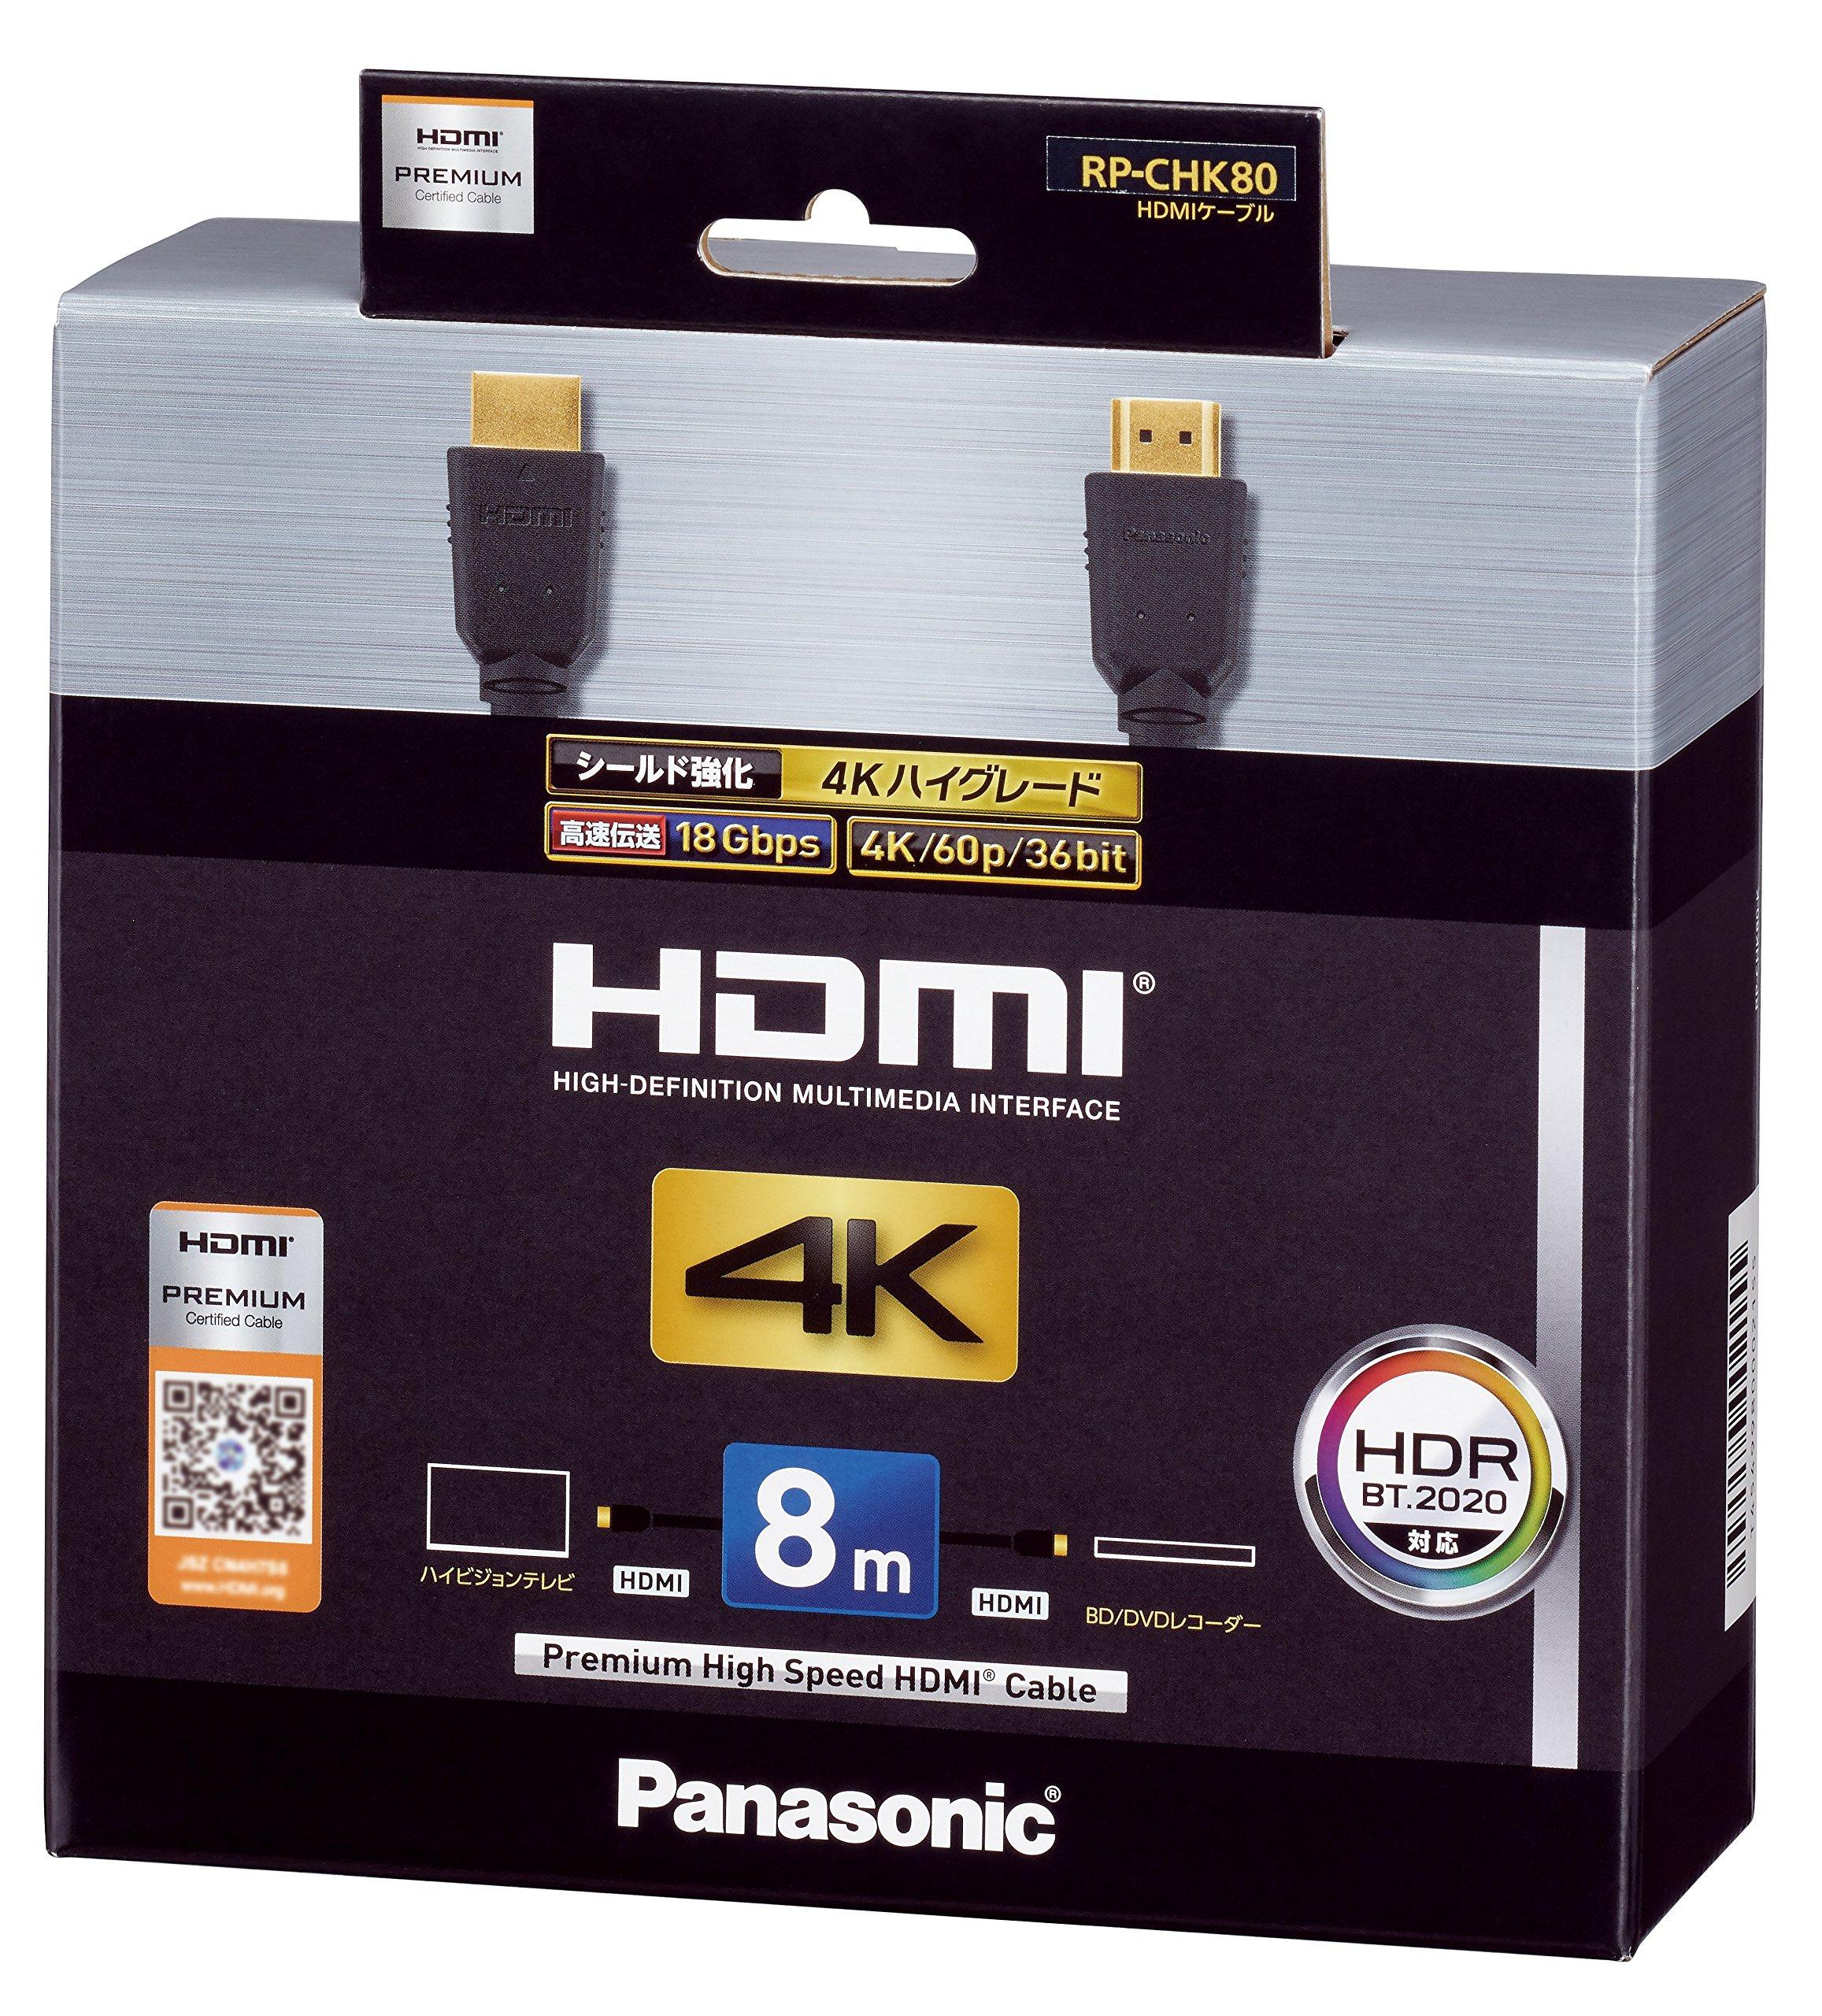 HDMIケーブル 8m ブラック RP-CHK80-K 1本